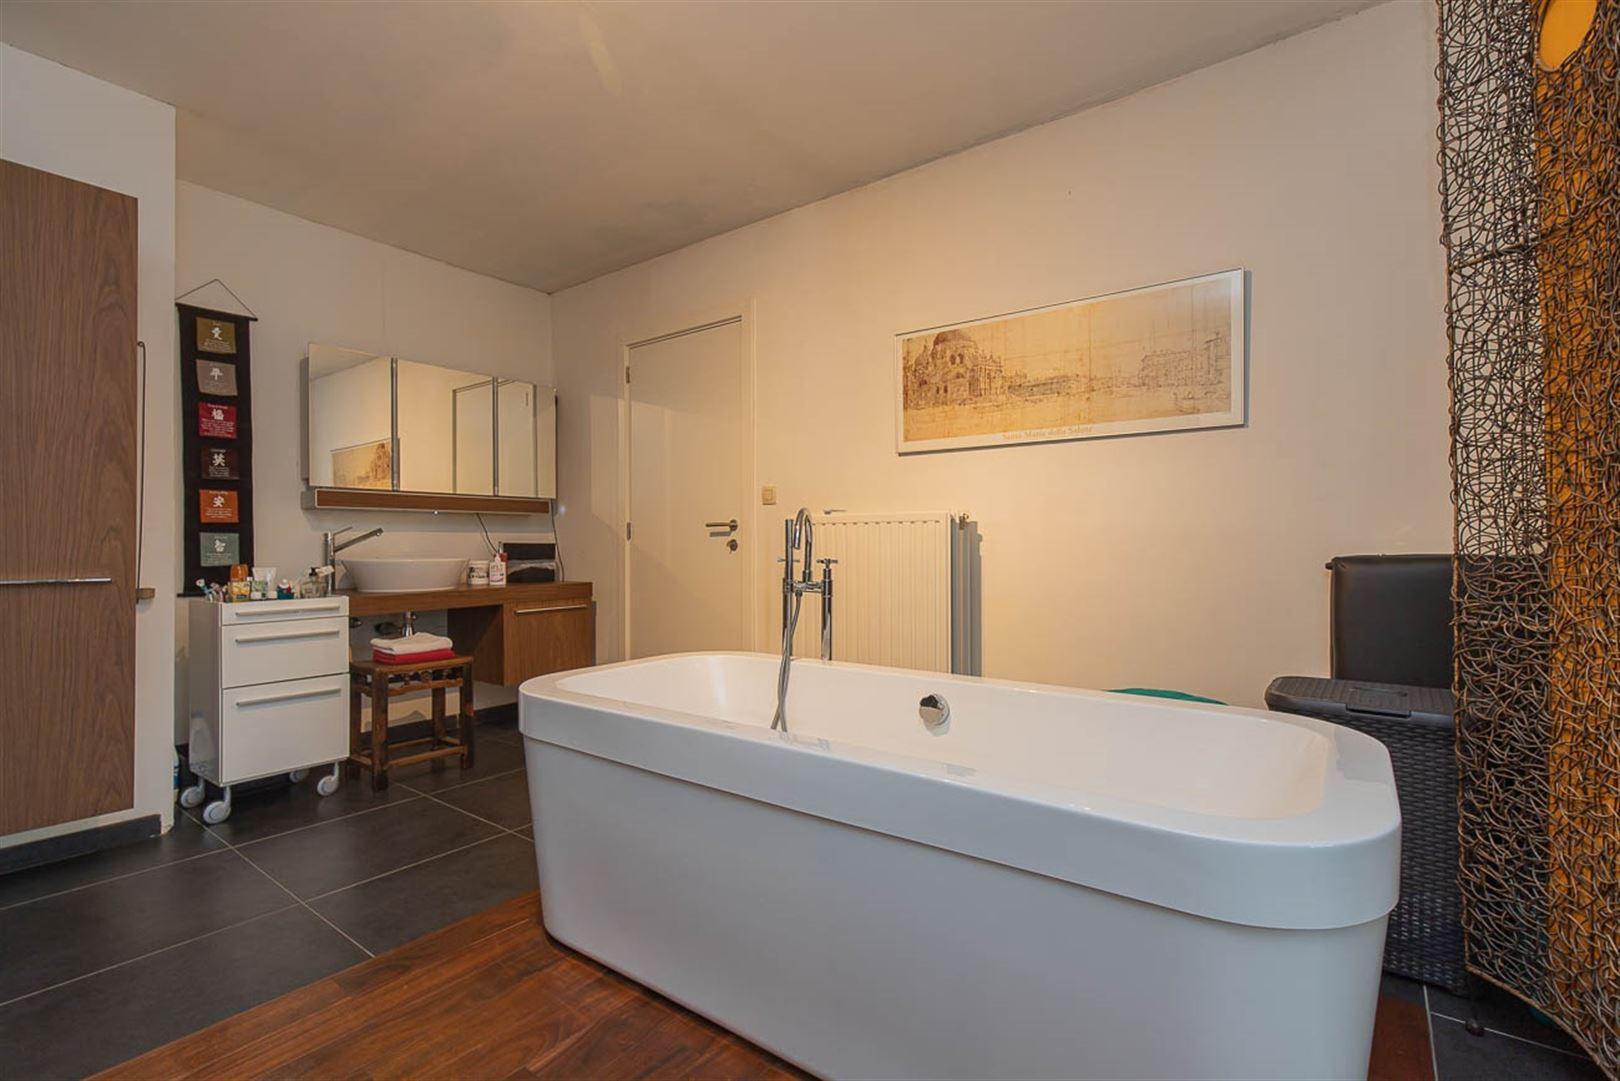 Foto 25 : Duplex/triplex te 9200 DENDERMONDE (België) - Prijs € 495.000